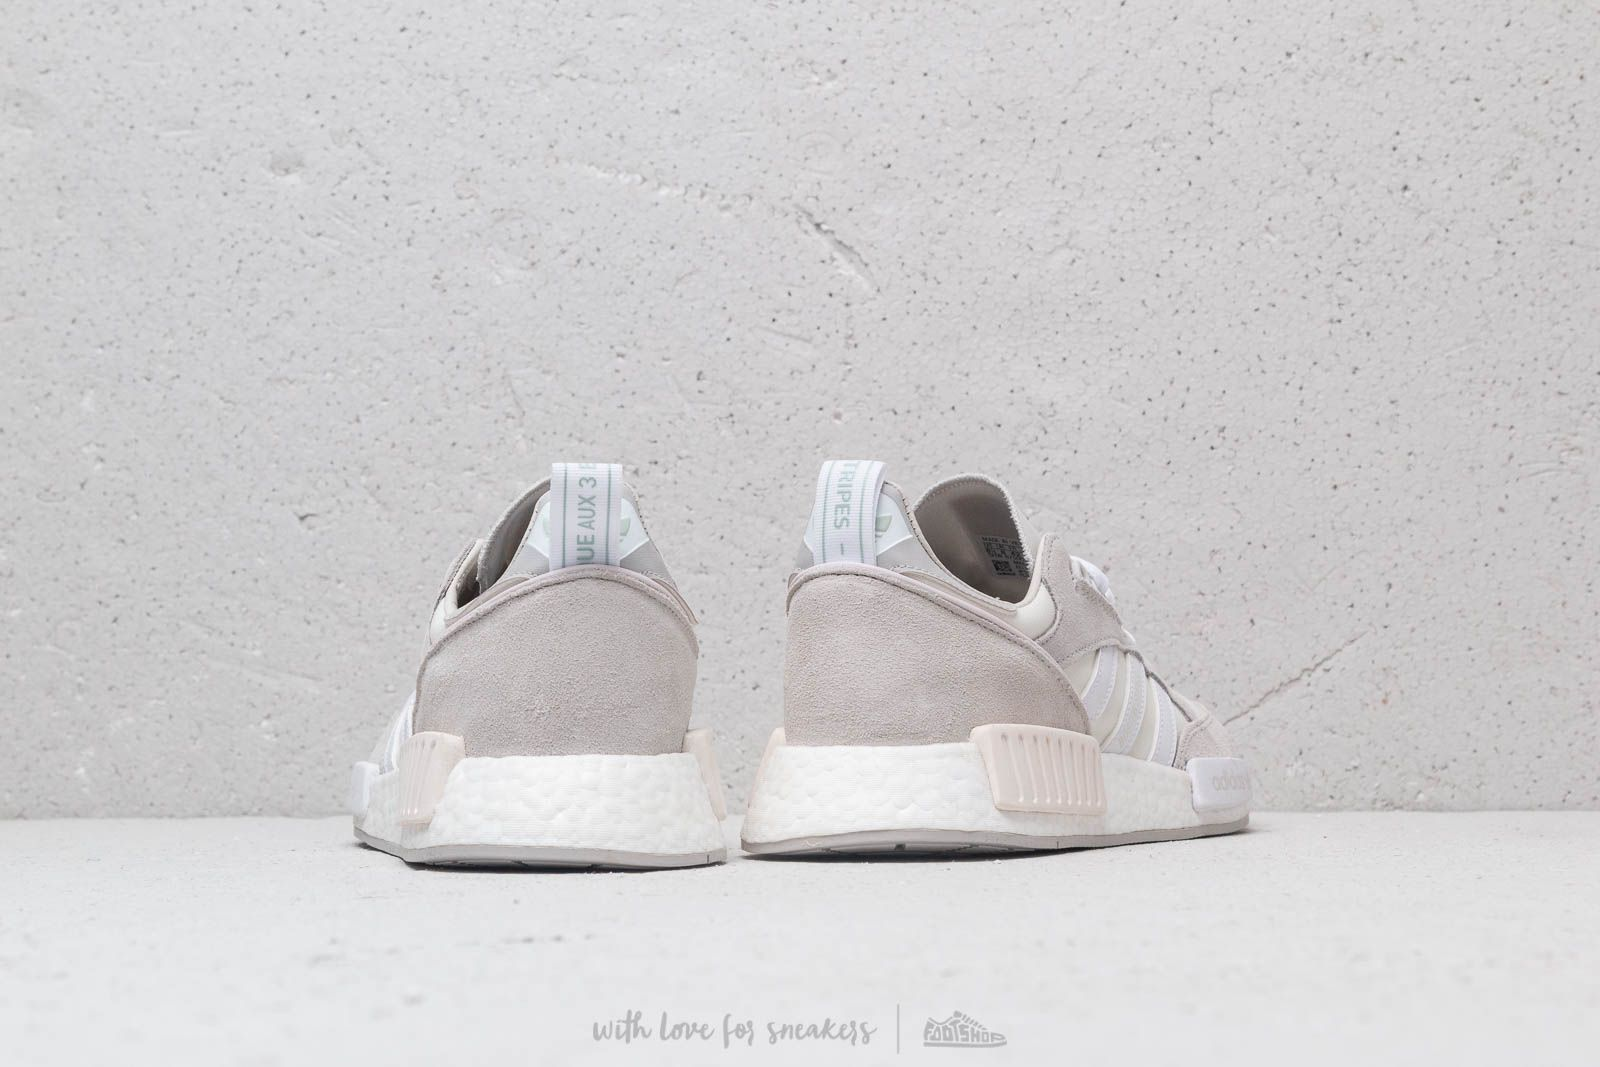 100% authentic 42d1e aa5c3 adidas Boston Super x R1 Cloud White Ftw White Grey One a muy buen